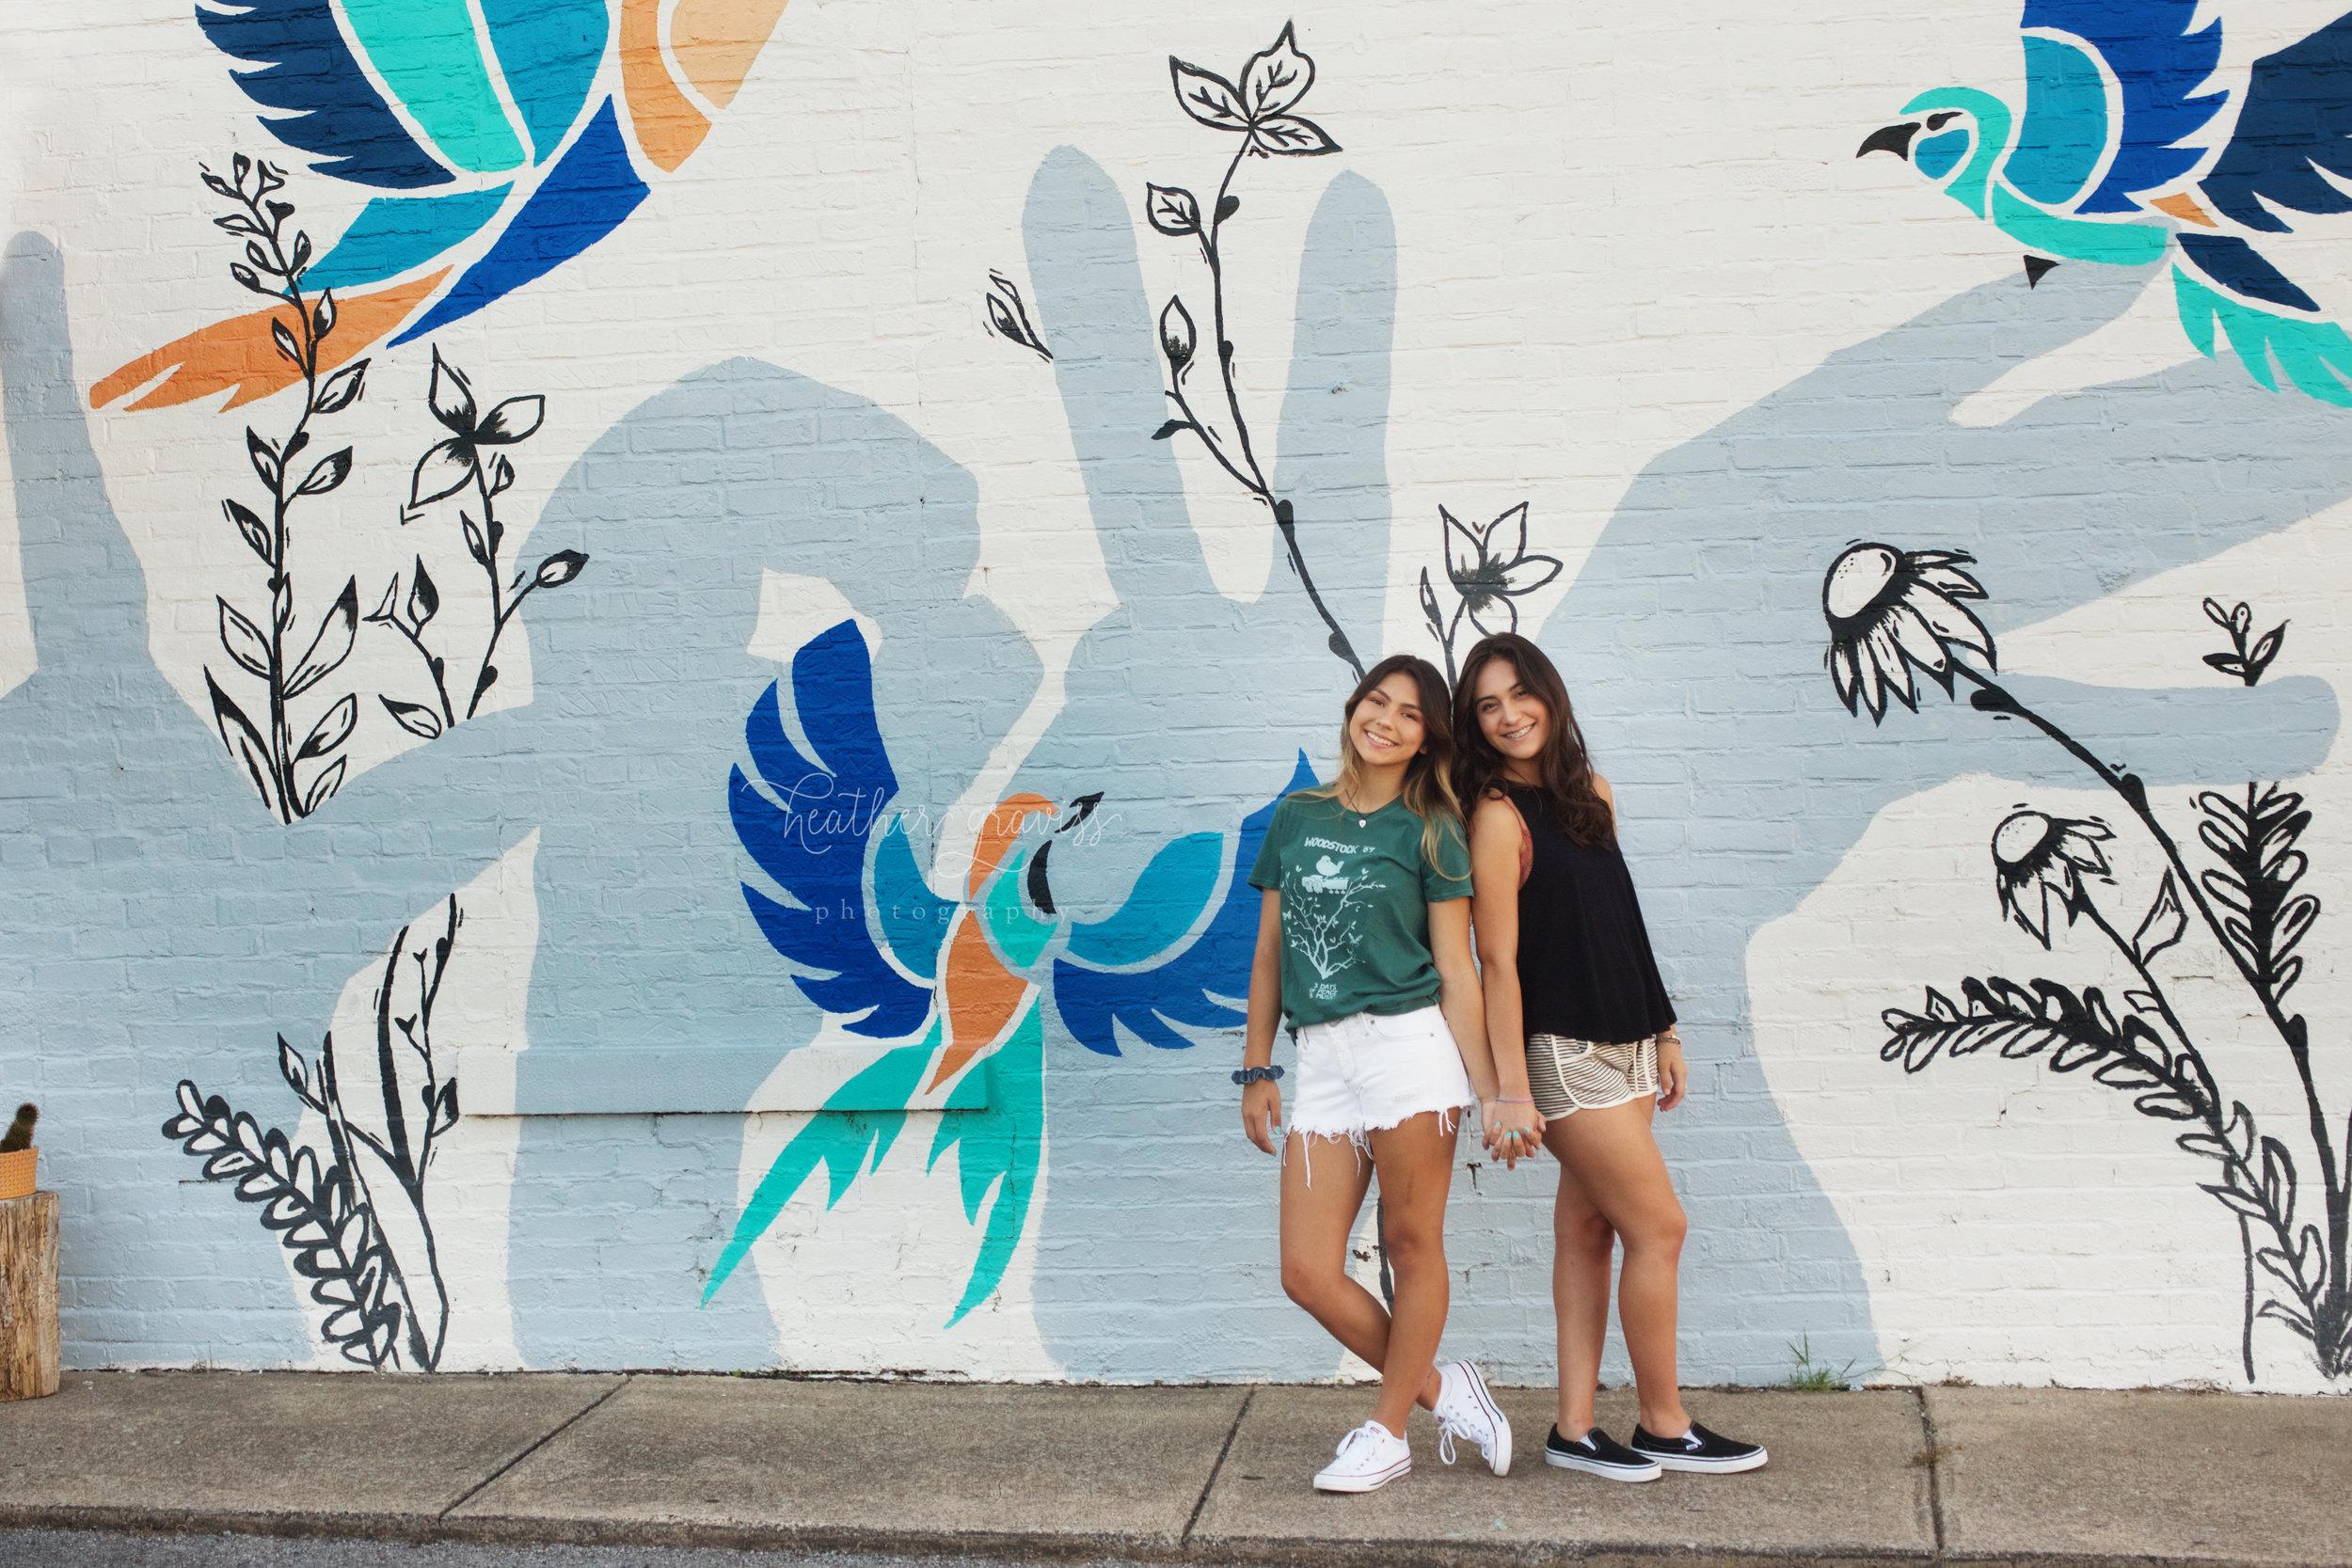 love-mural-lebanon-tn.jpg